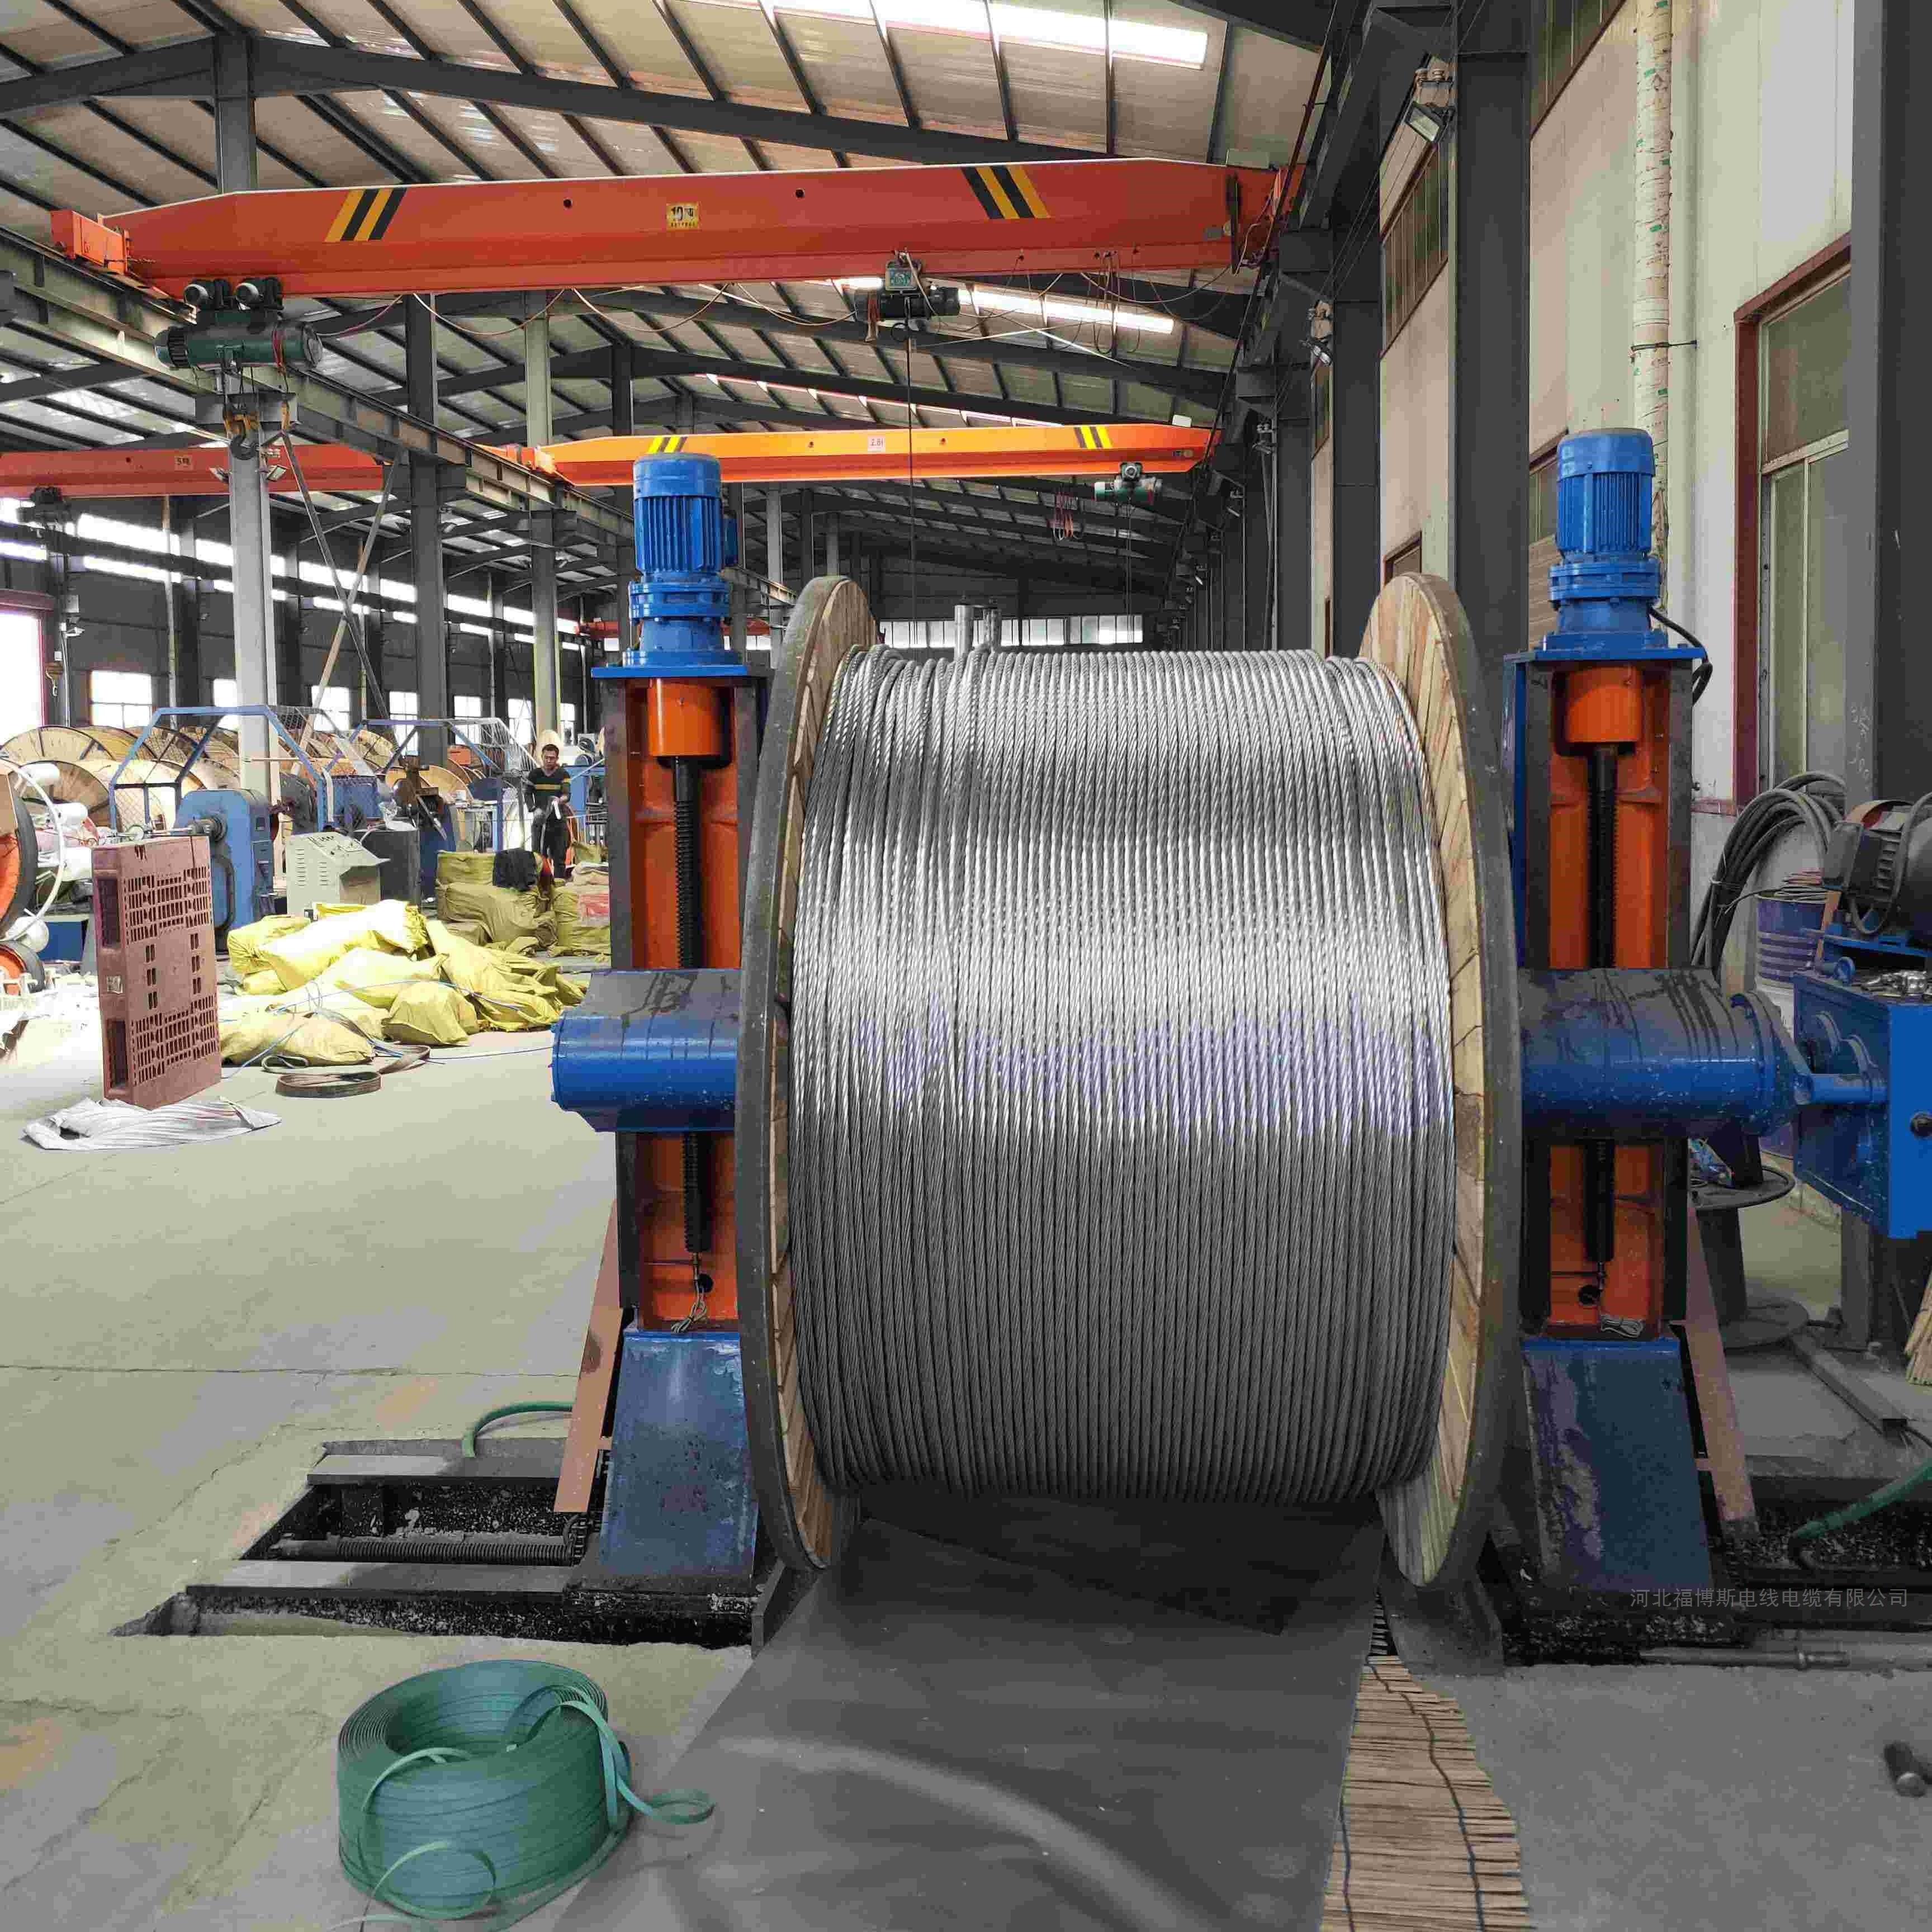 JNRLH58/G1A-1000/45耐热铝合金钢芯绞线